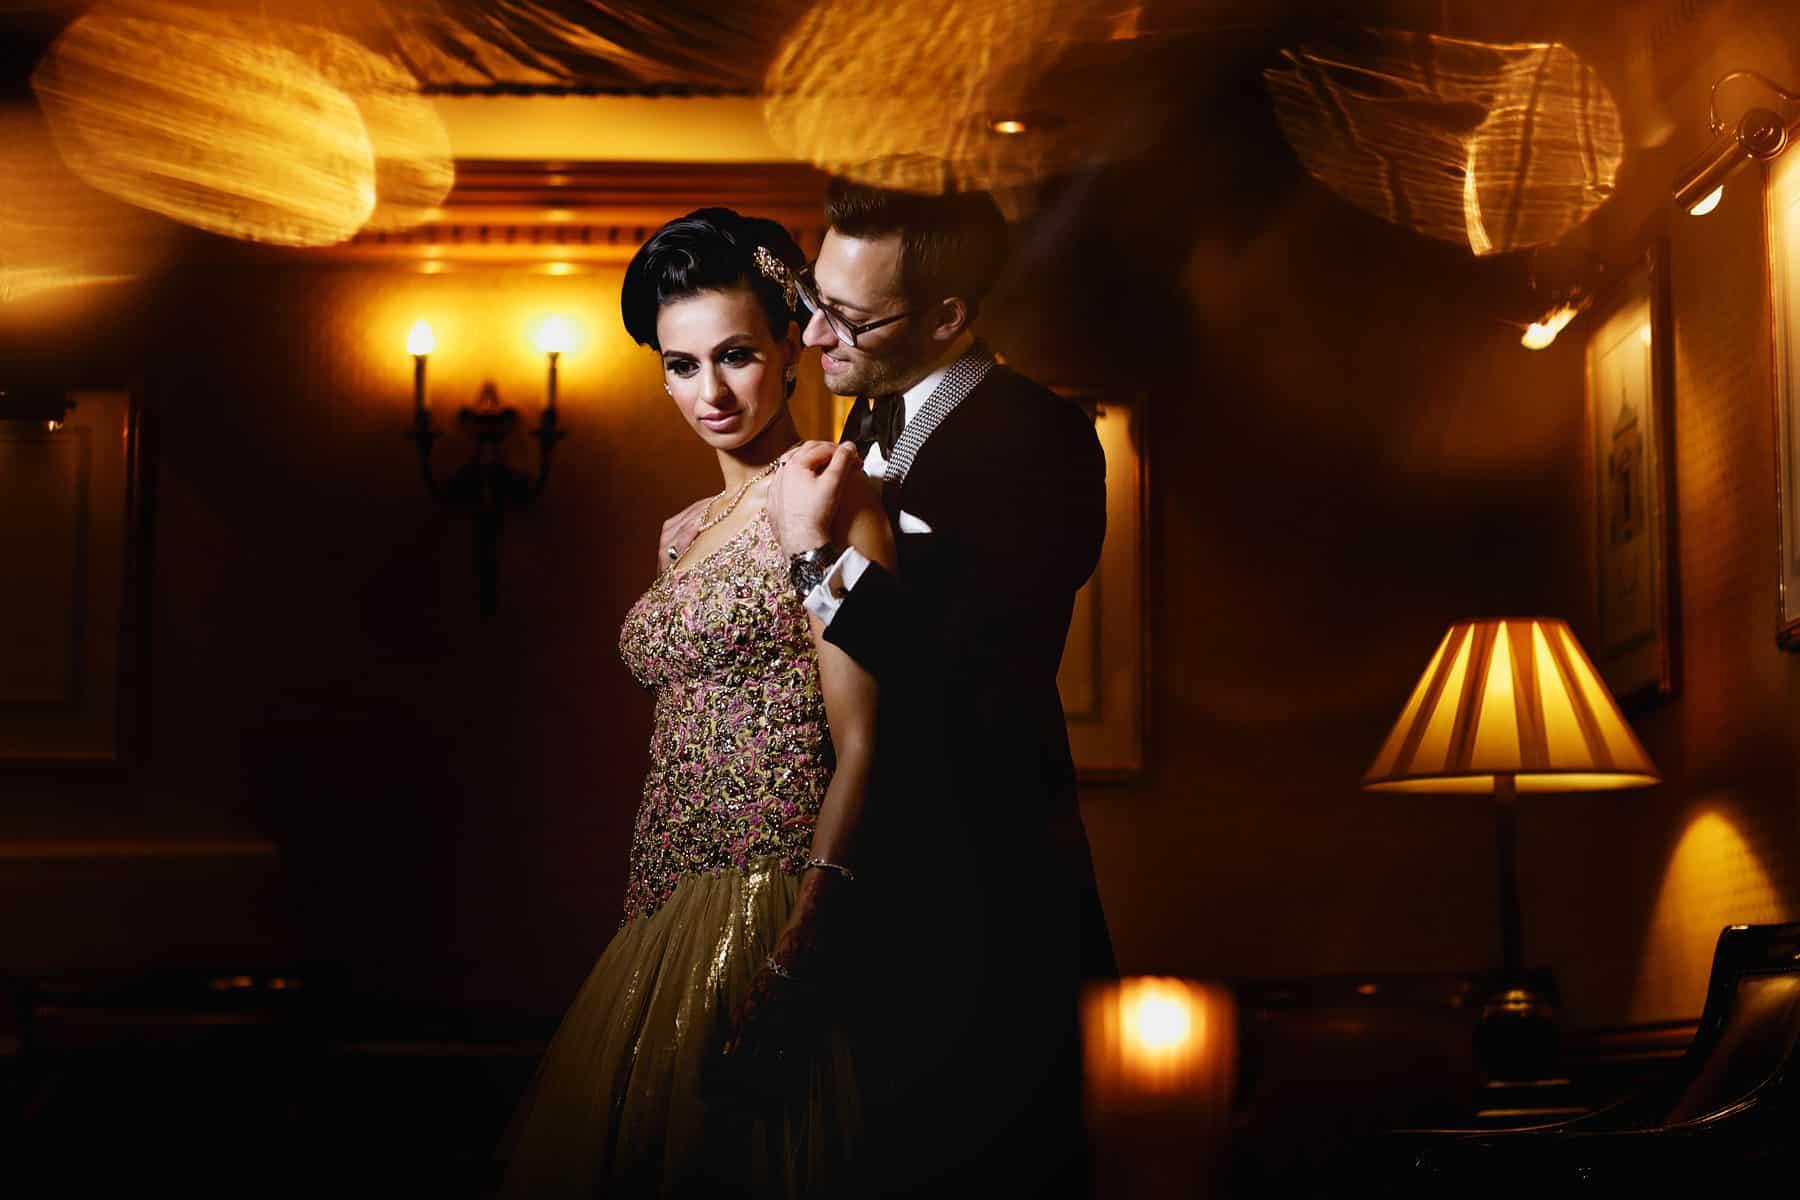 lancaster london weddings